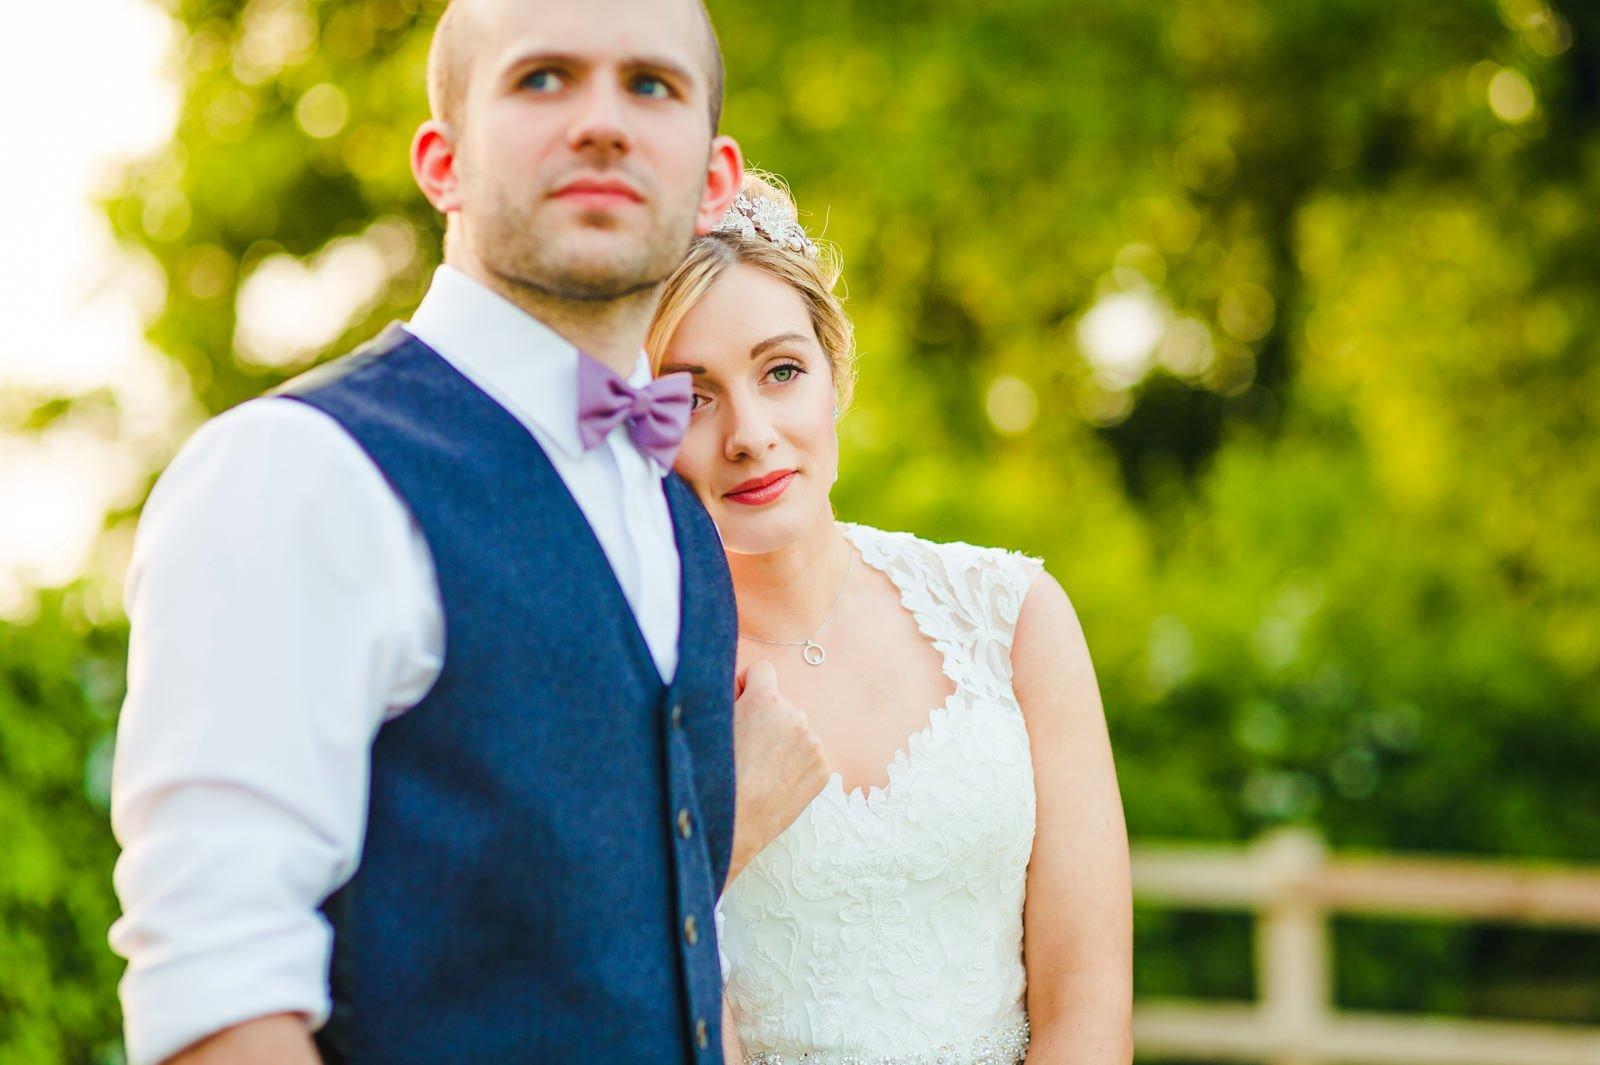 Millers Of Netley wedding, Dorrington, Shrewsbury | Emma + Ben 89